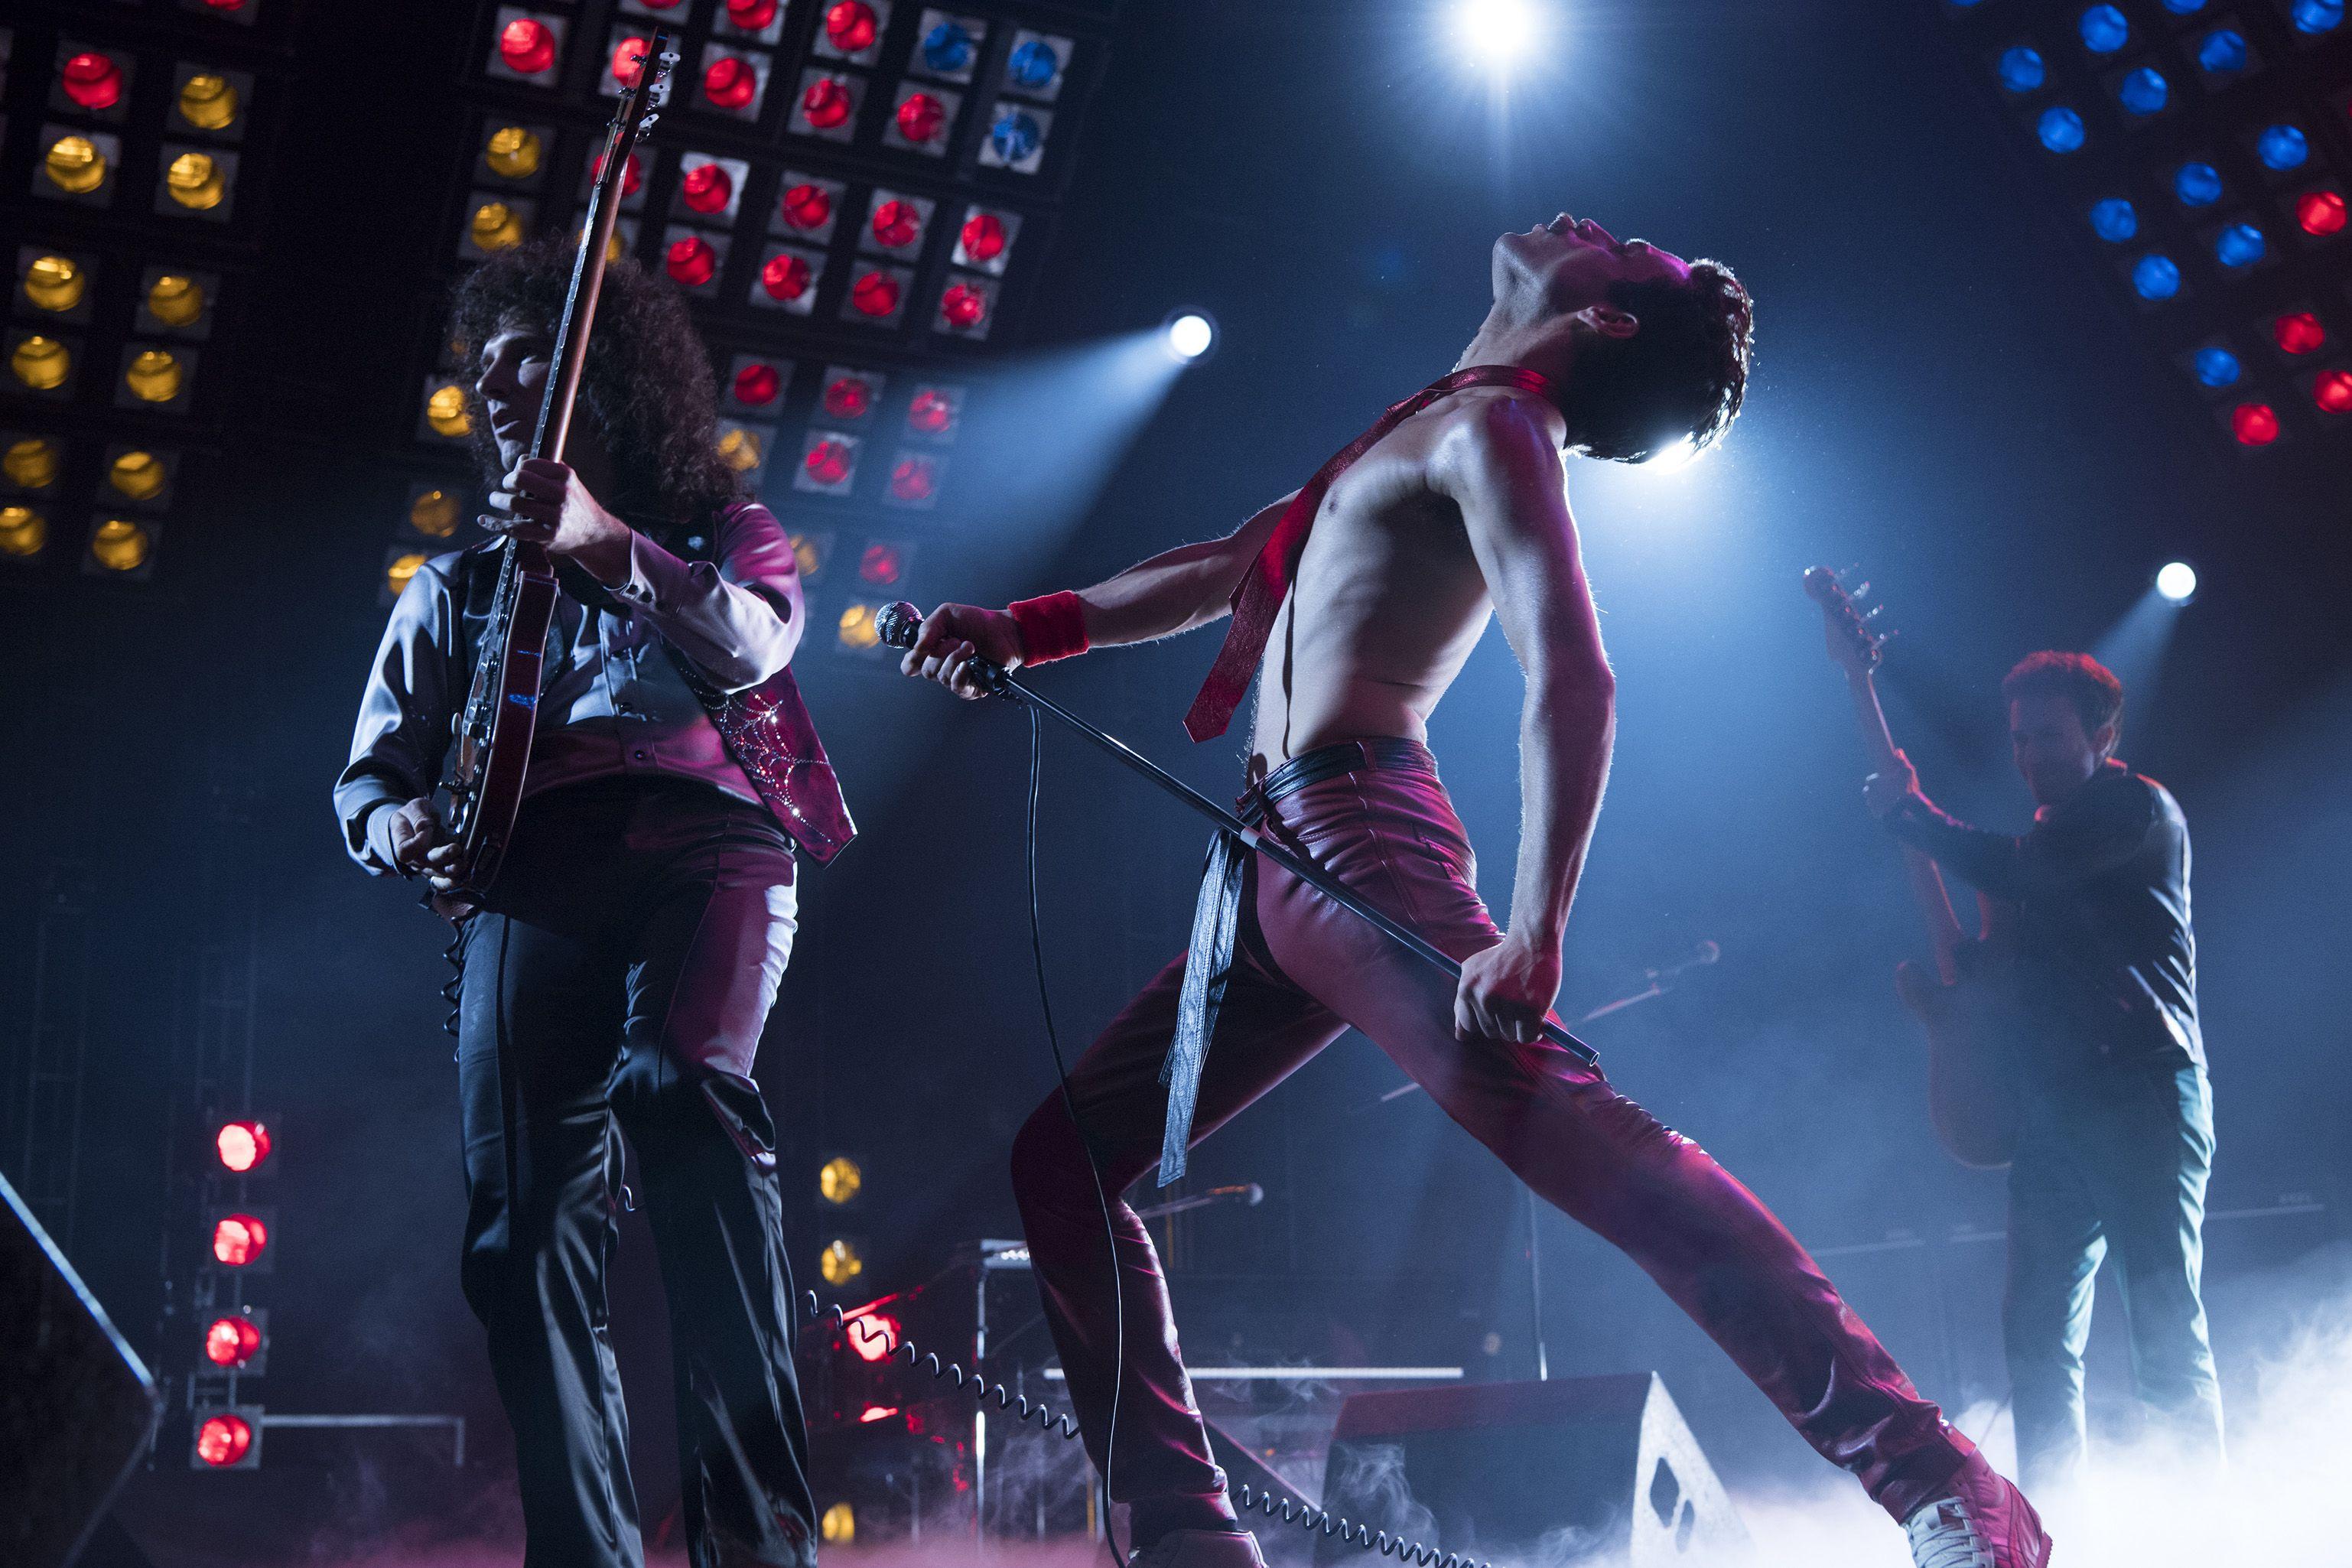 How Julian Day Transformed Rami Malek Into Flamboyant Rocker Freddie Mercury  for Bohemian Rhapsody c49a2ccc6